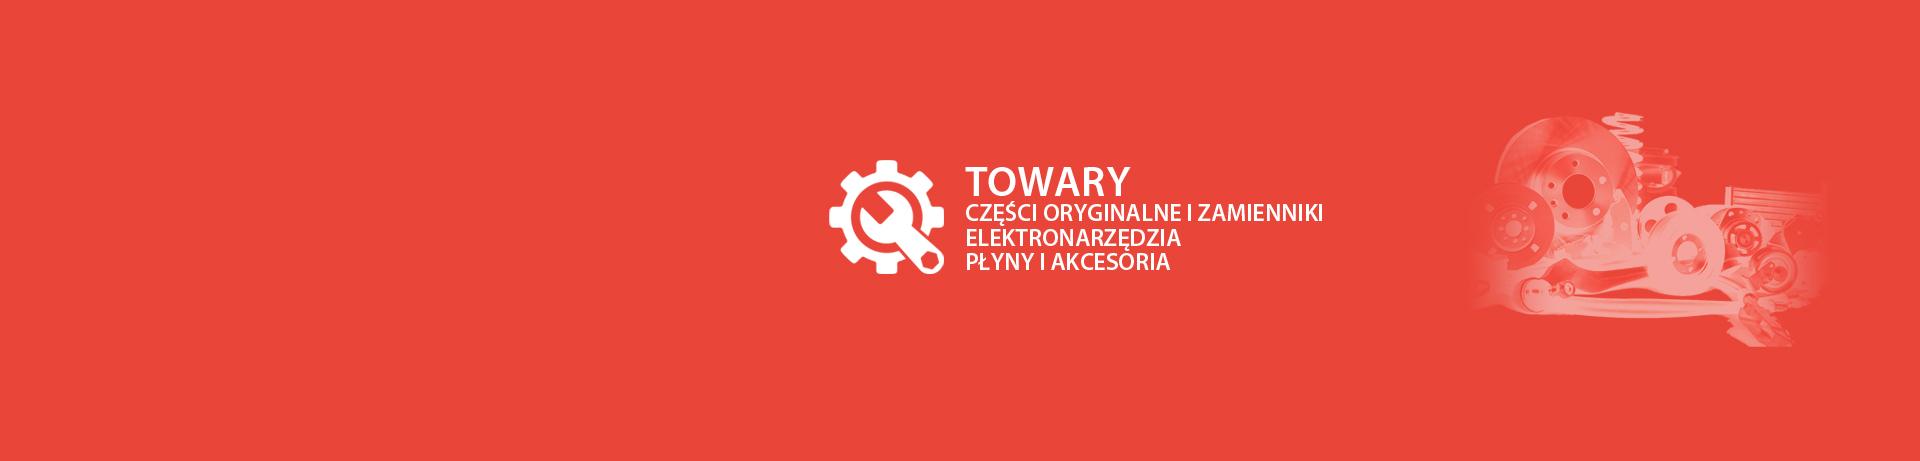 towary - banner